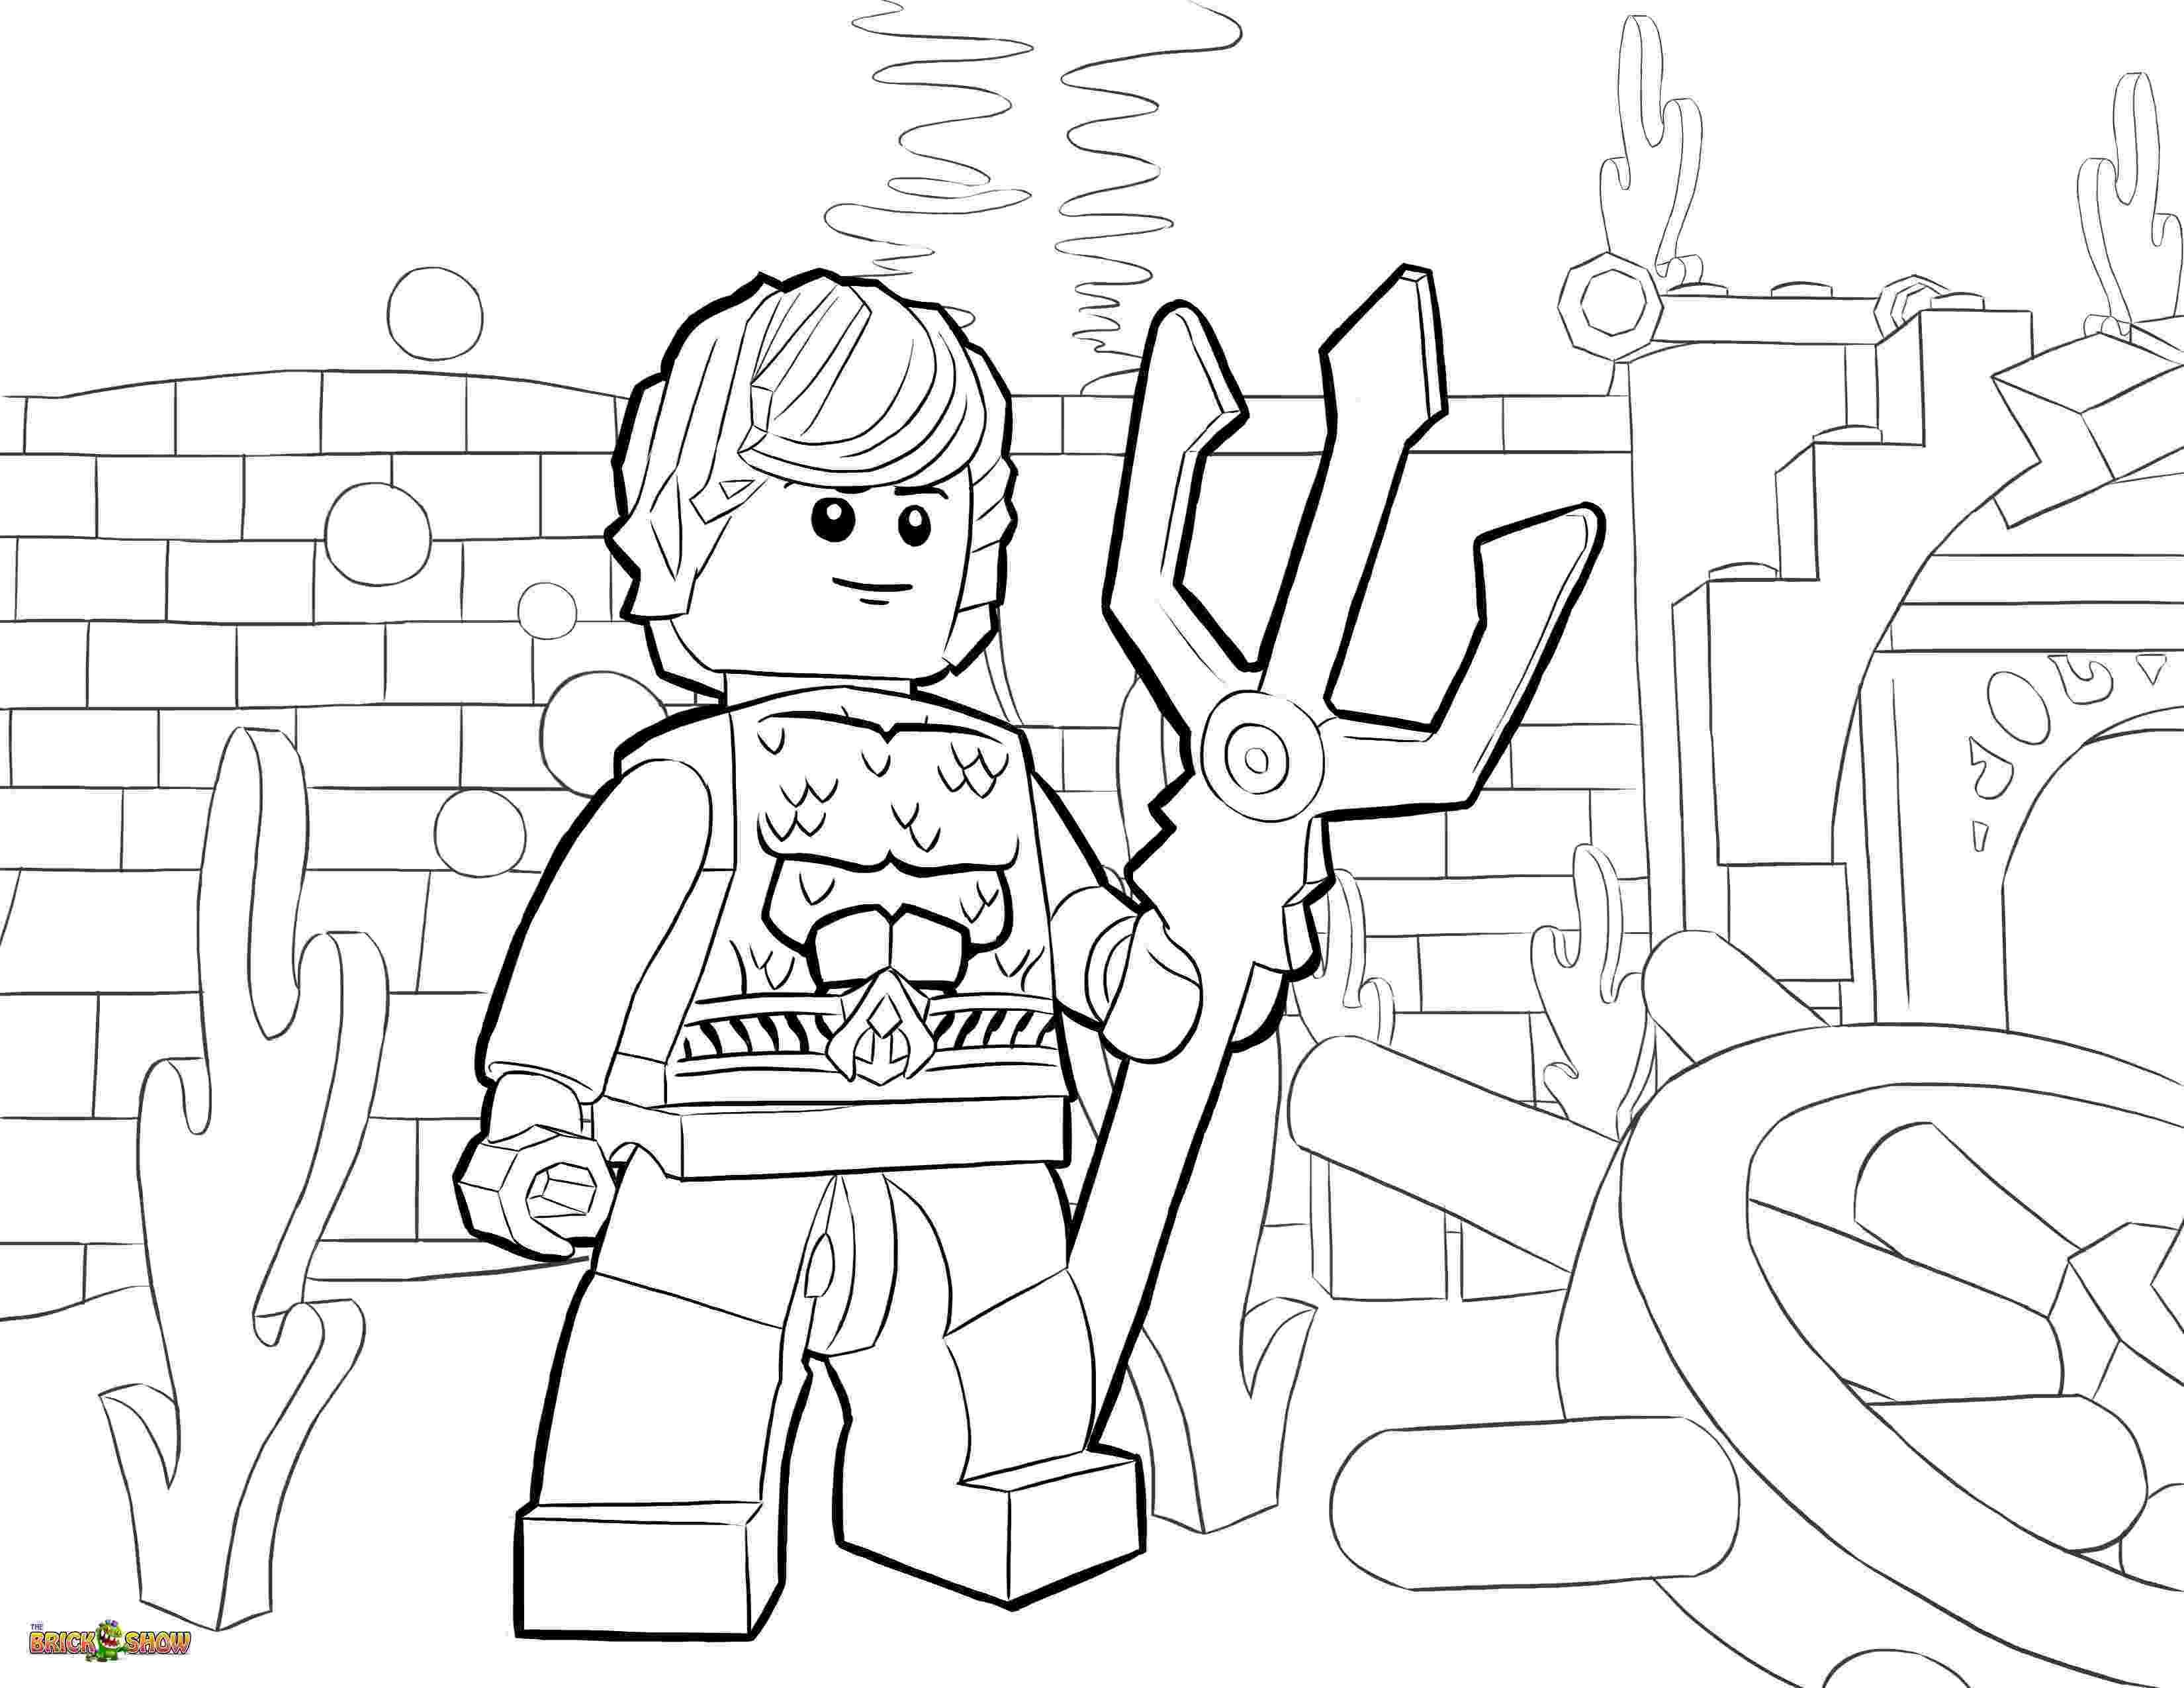 lego superheroes coloring pages printable coloring sheets lego google search superhero lego coloring pages superheroes